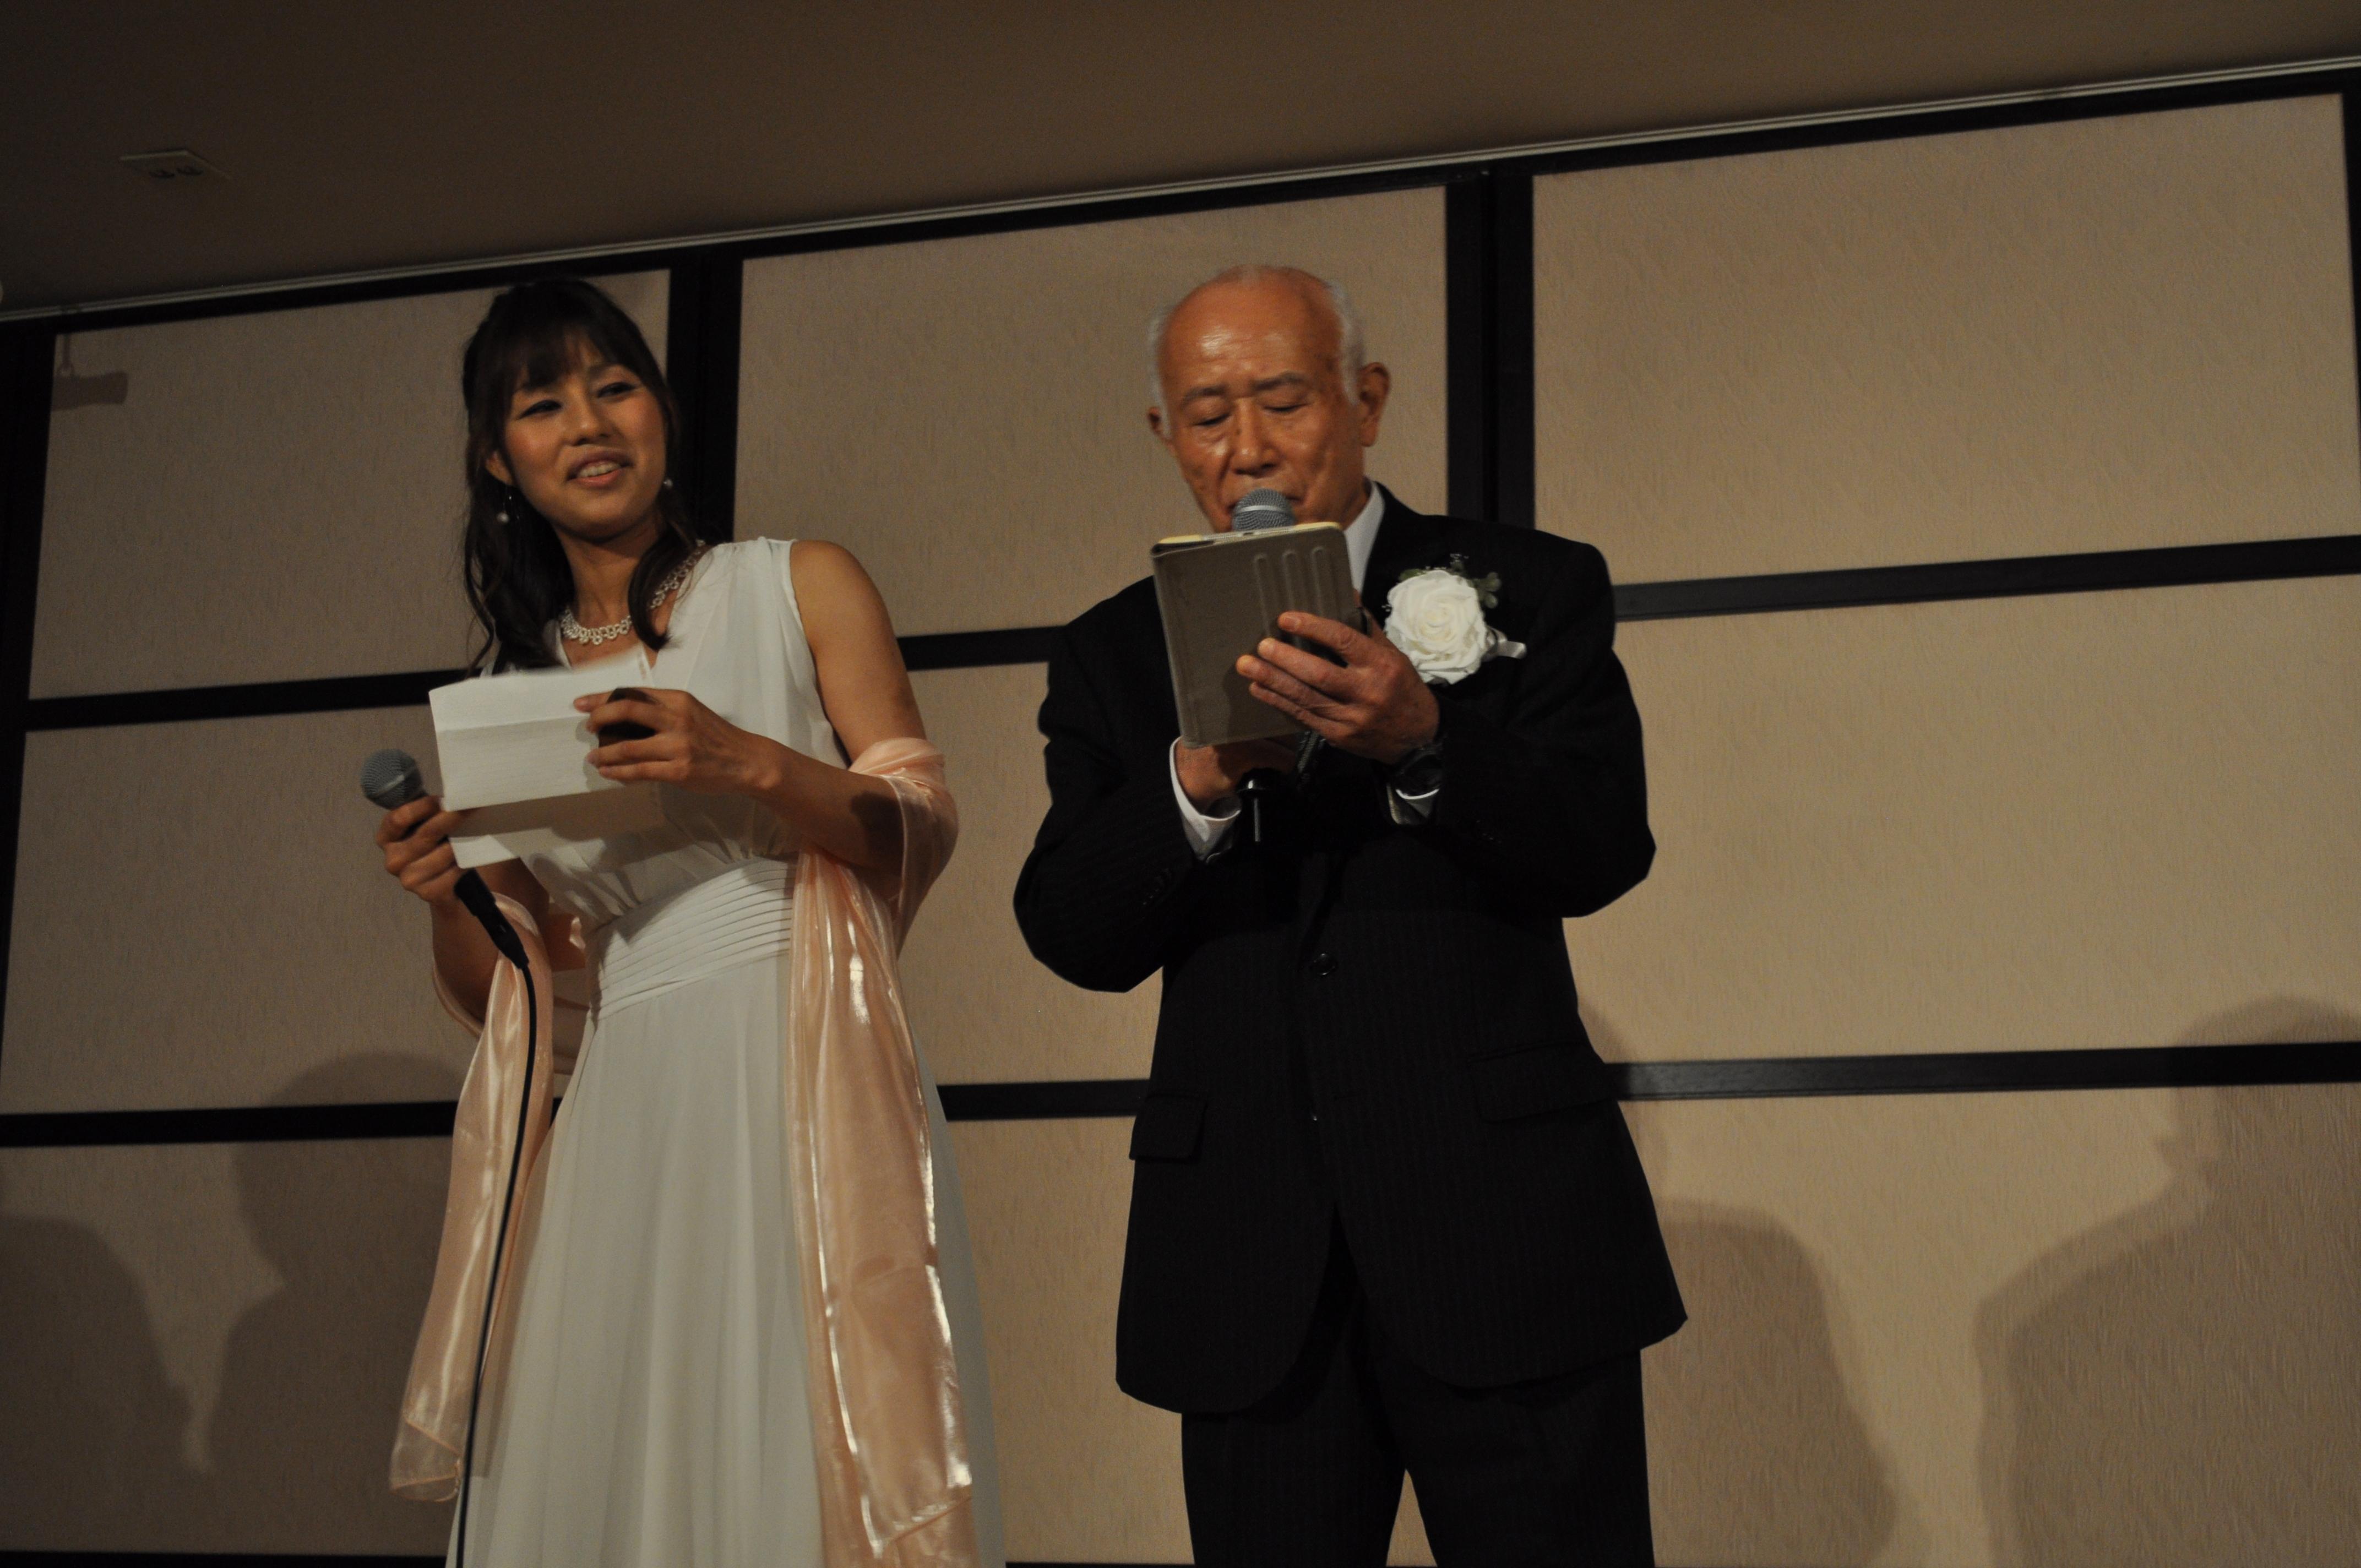 DSC 0502 - 第6回思風会全国大会2018in東京開催